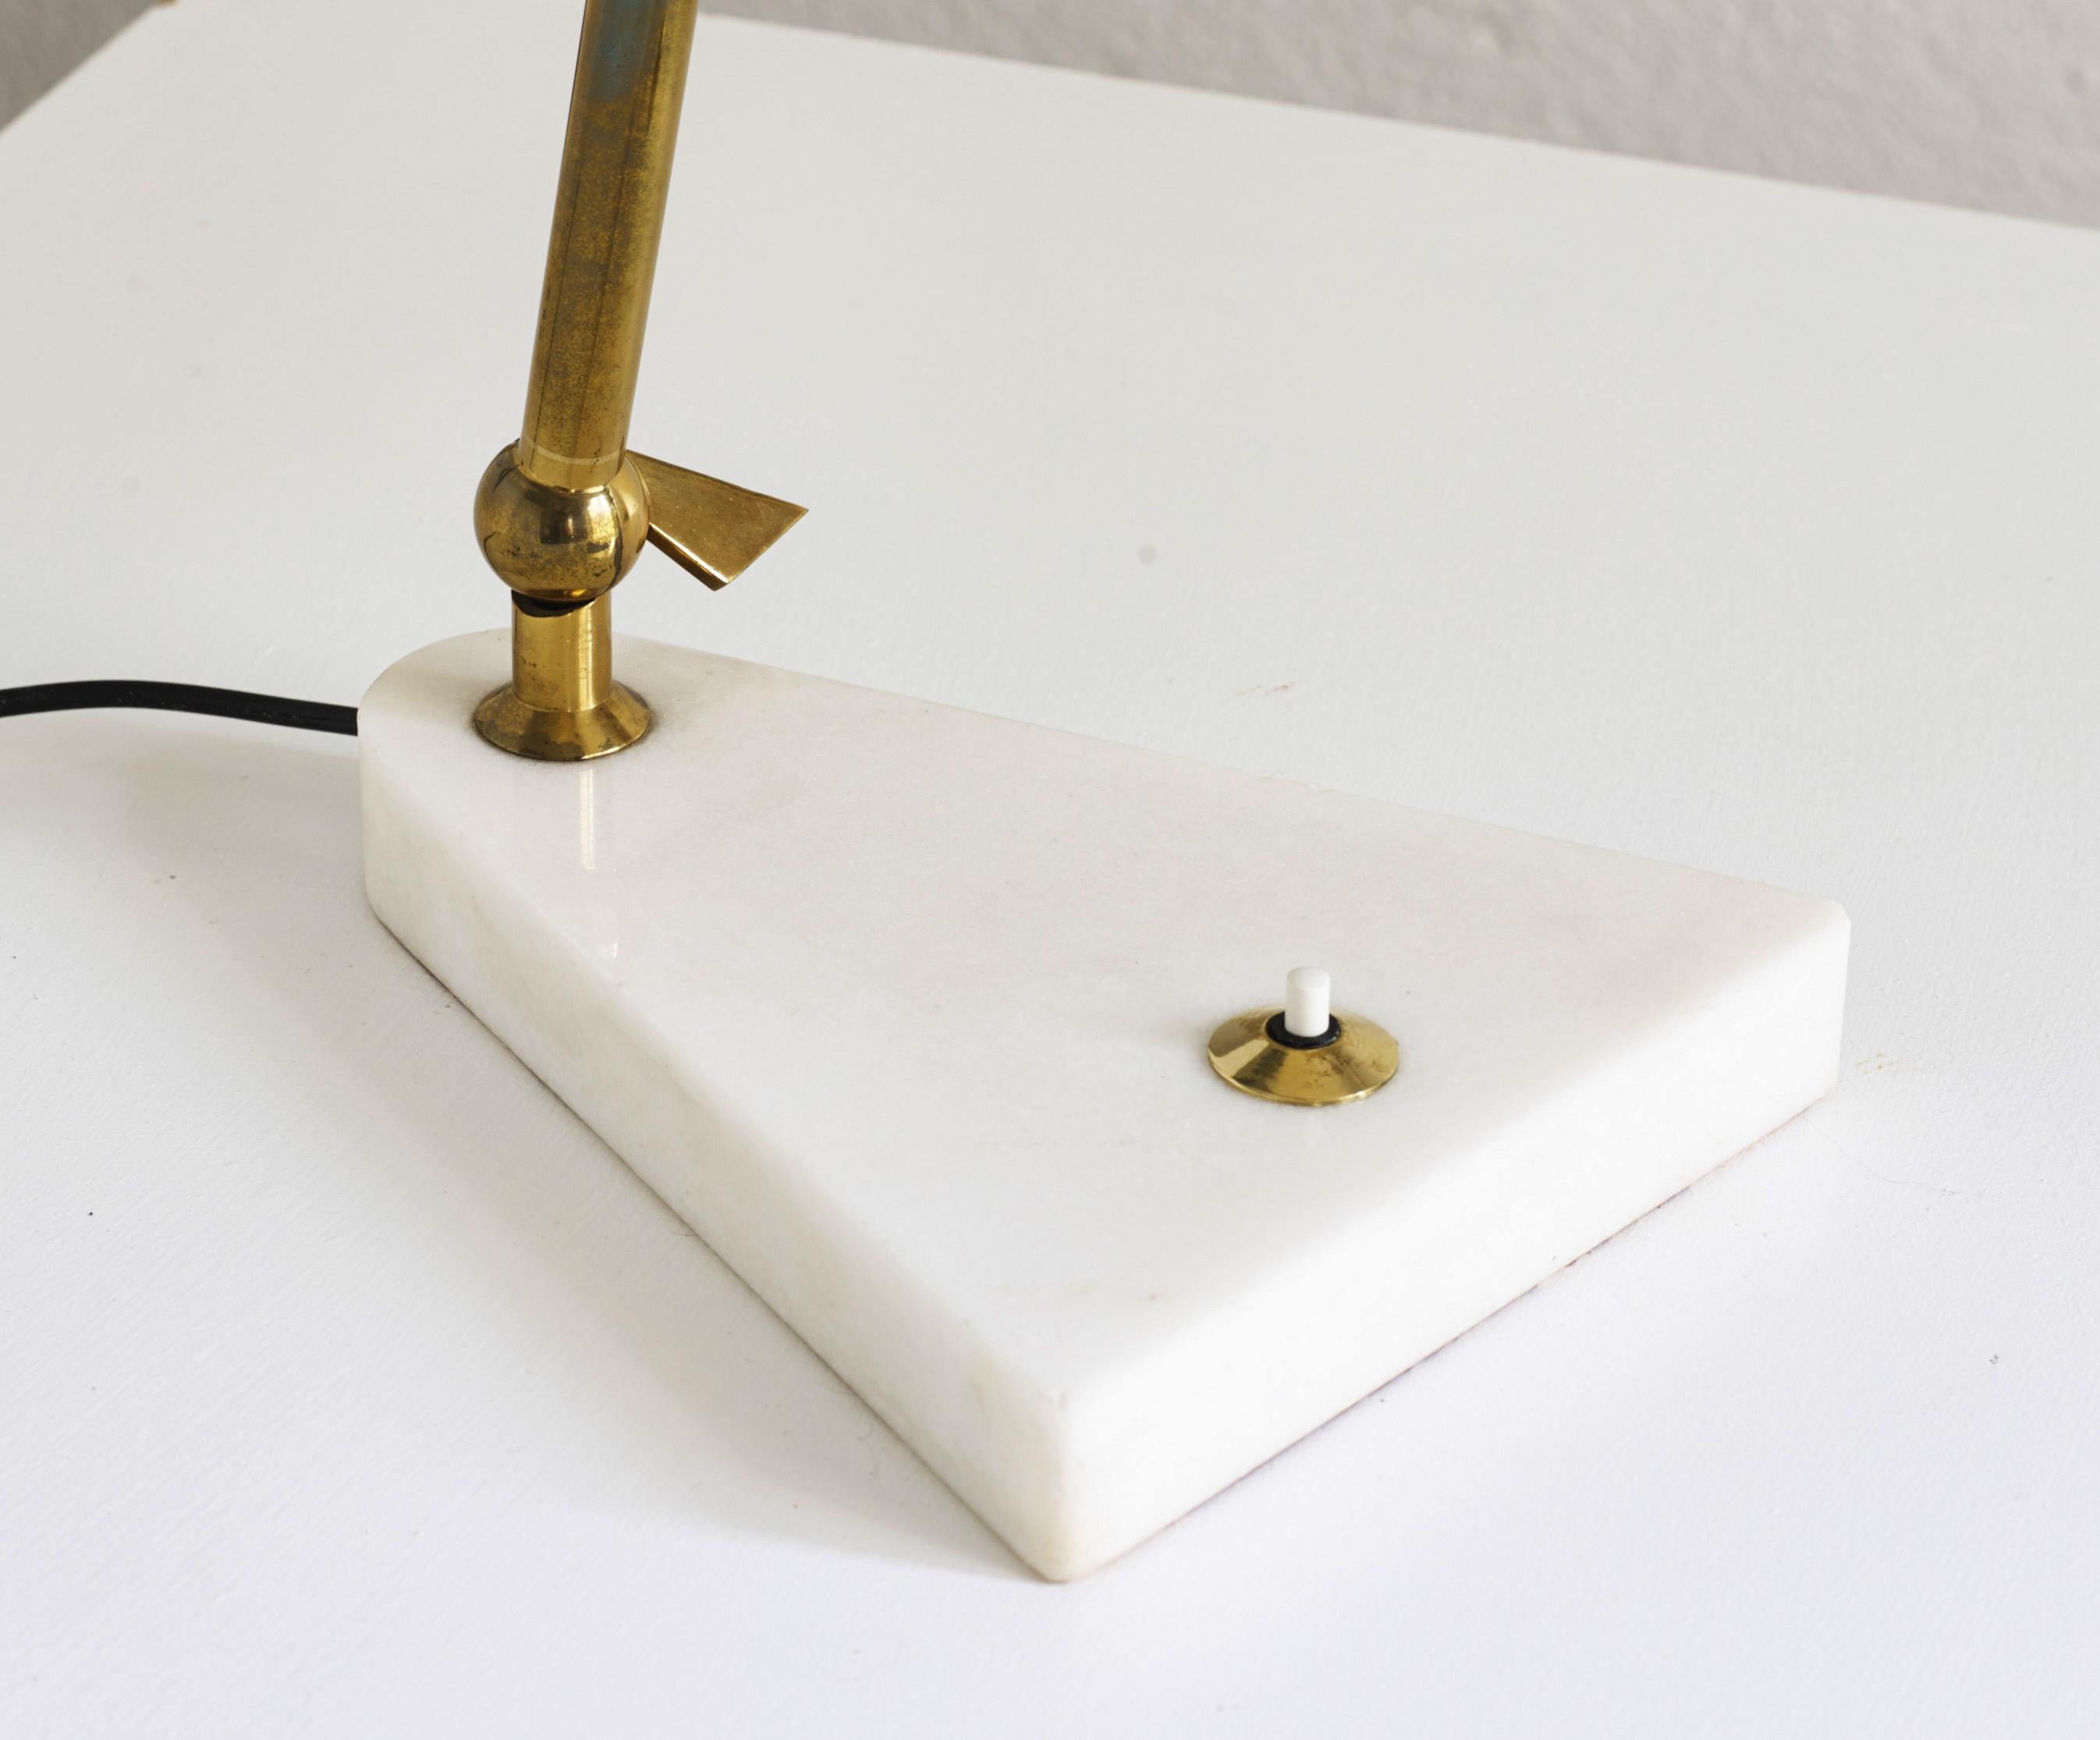 stilux-table-lamp-image-07